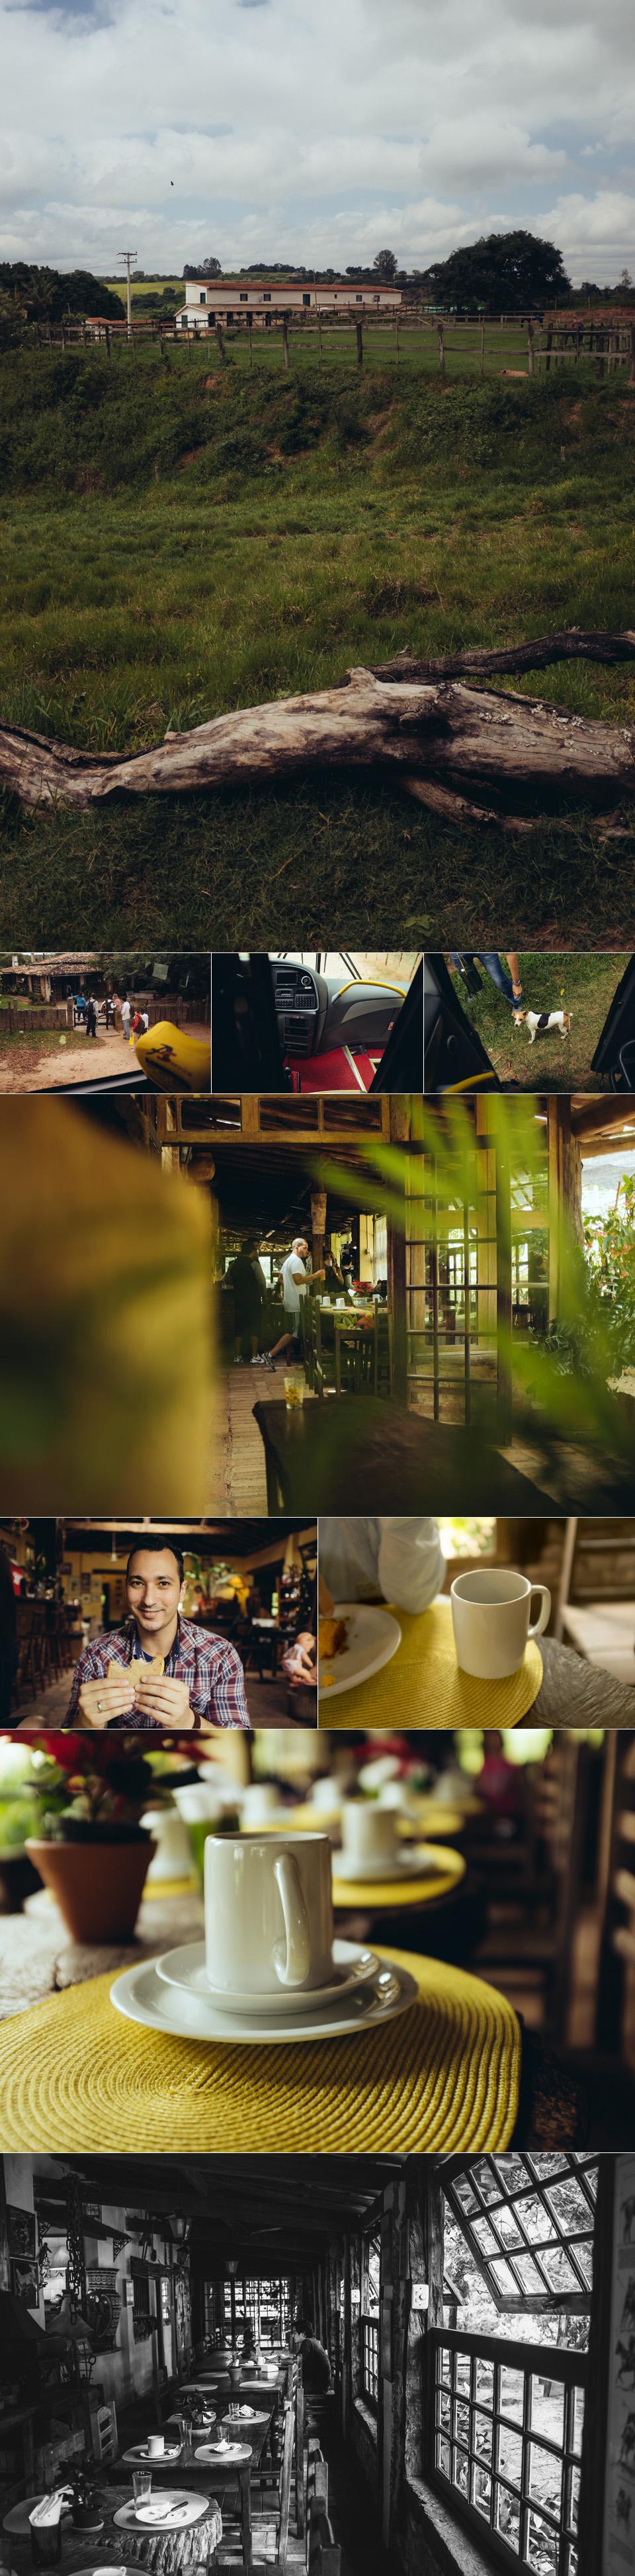 2-cafe.jpg